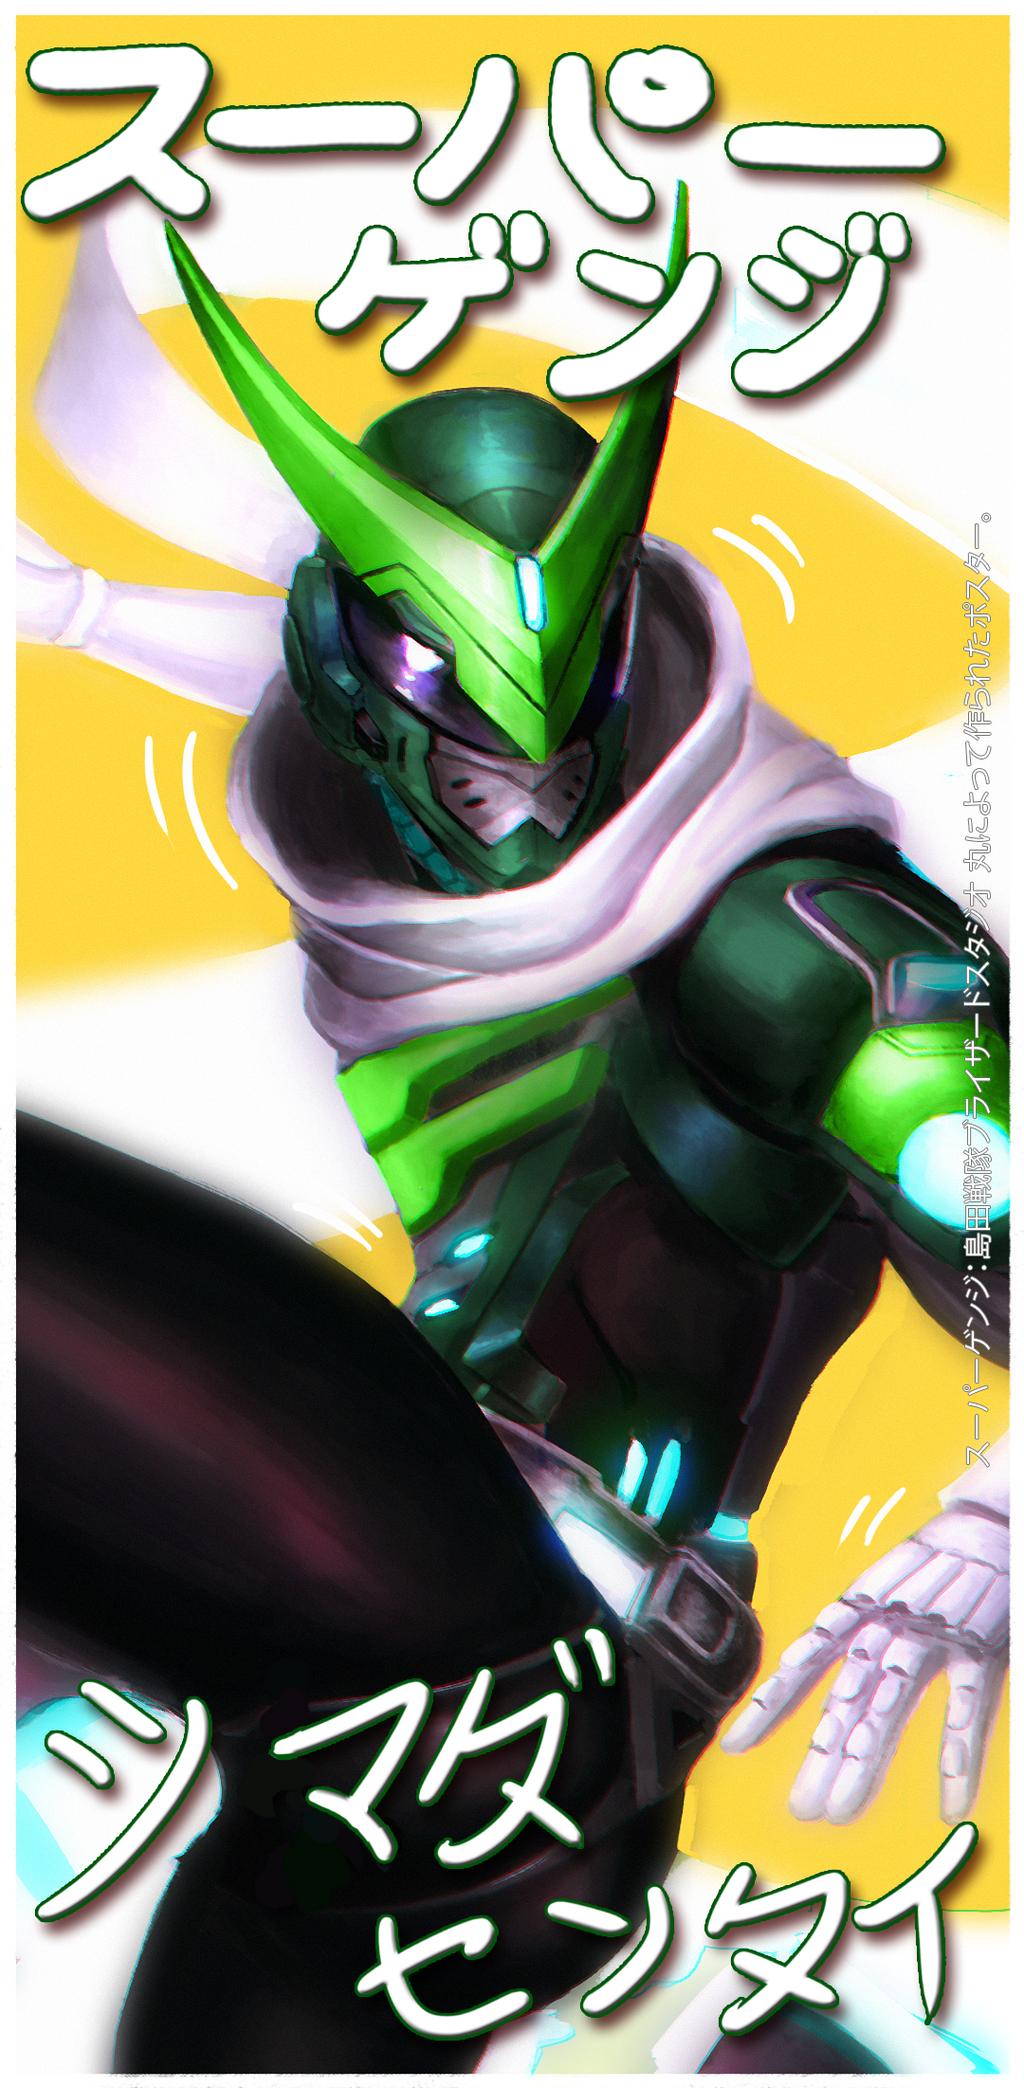 Super Genji: Shimada Sentai! by MaruMun